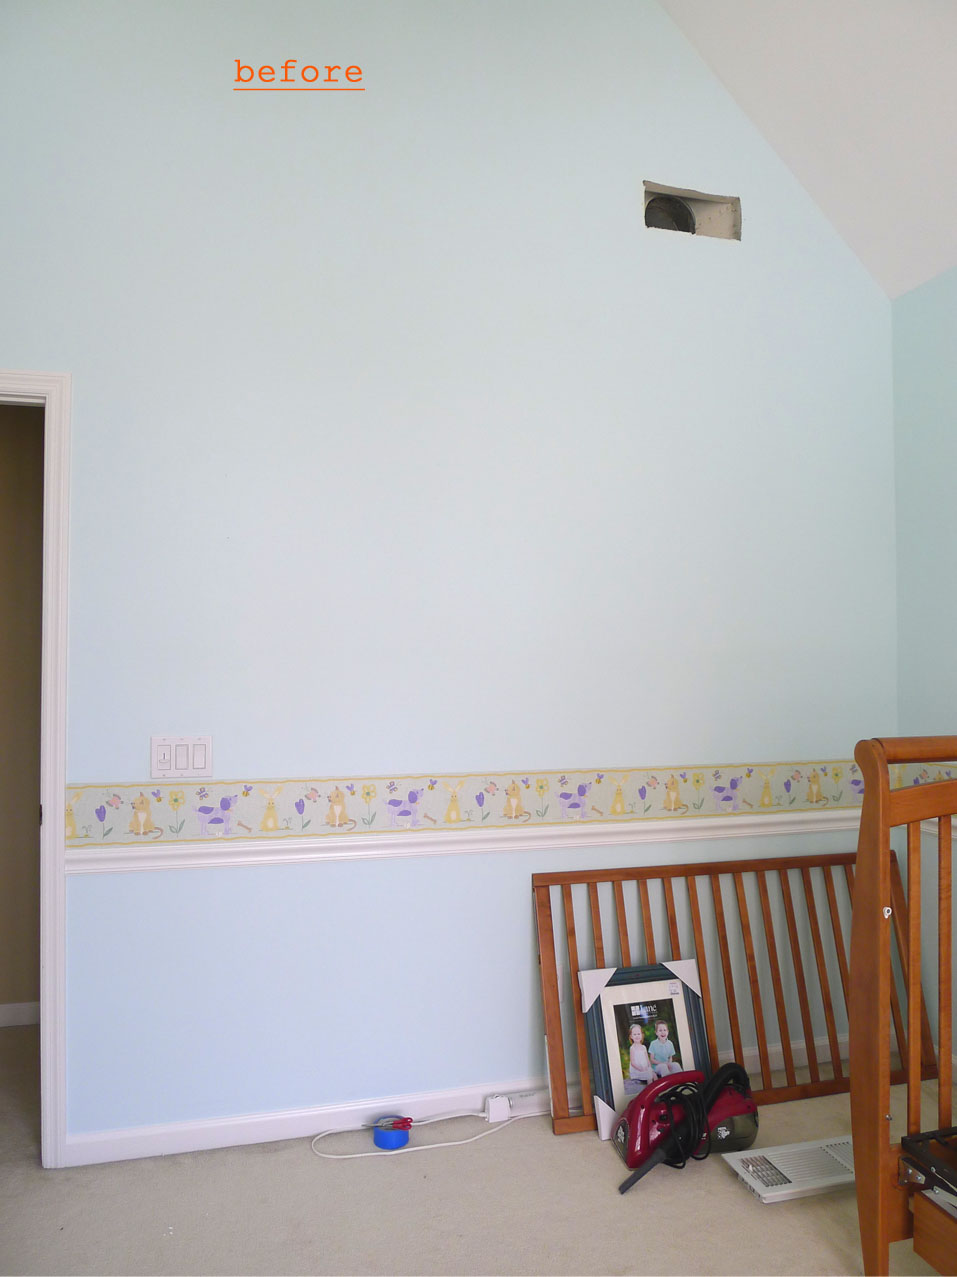 Baby nursery part 1 wall mural diy sweetsourmoments baby nursery wall 2 amipublicfo Choice Image